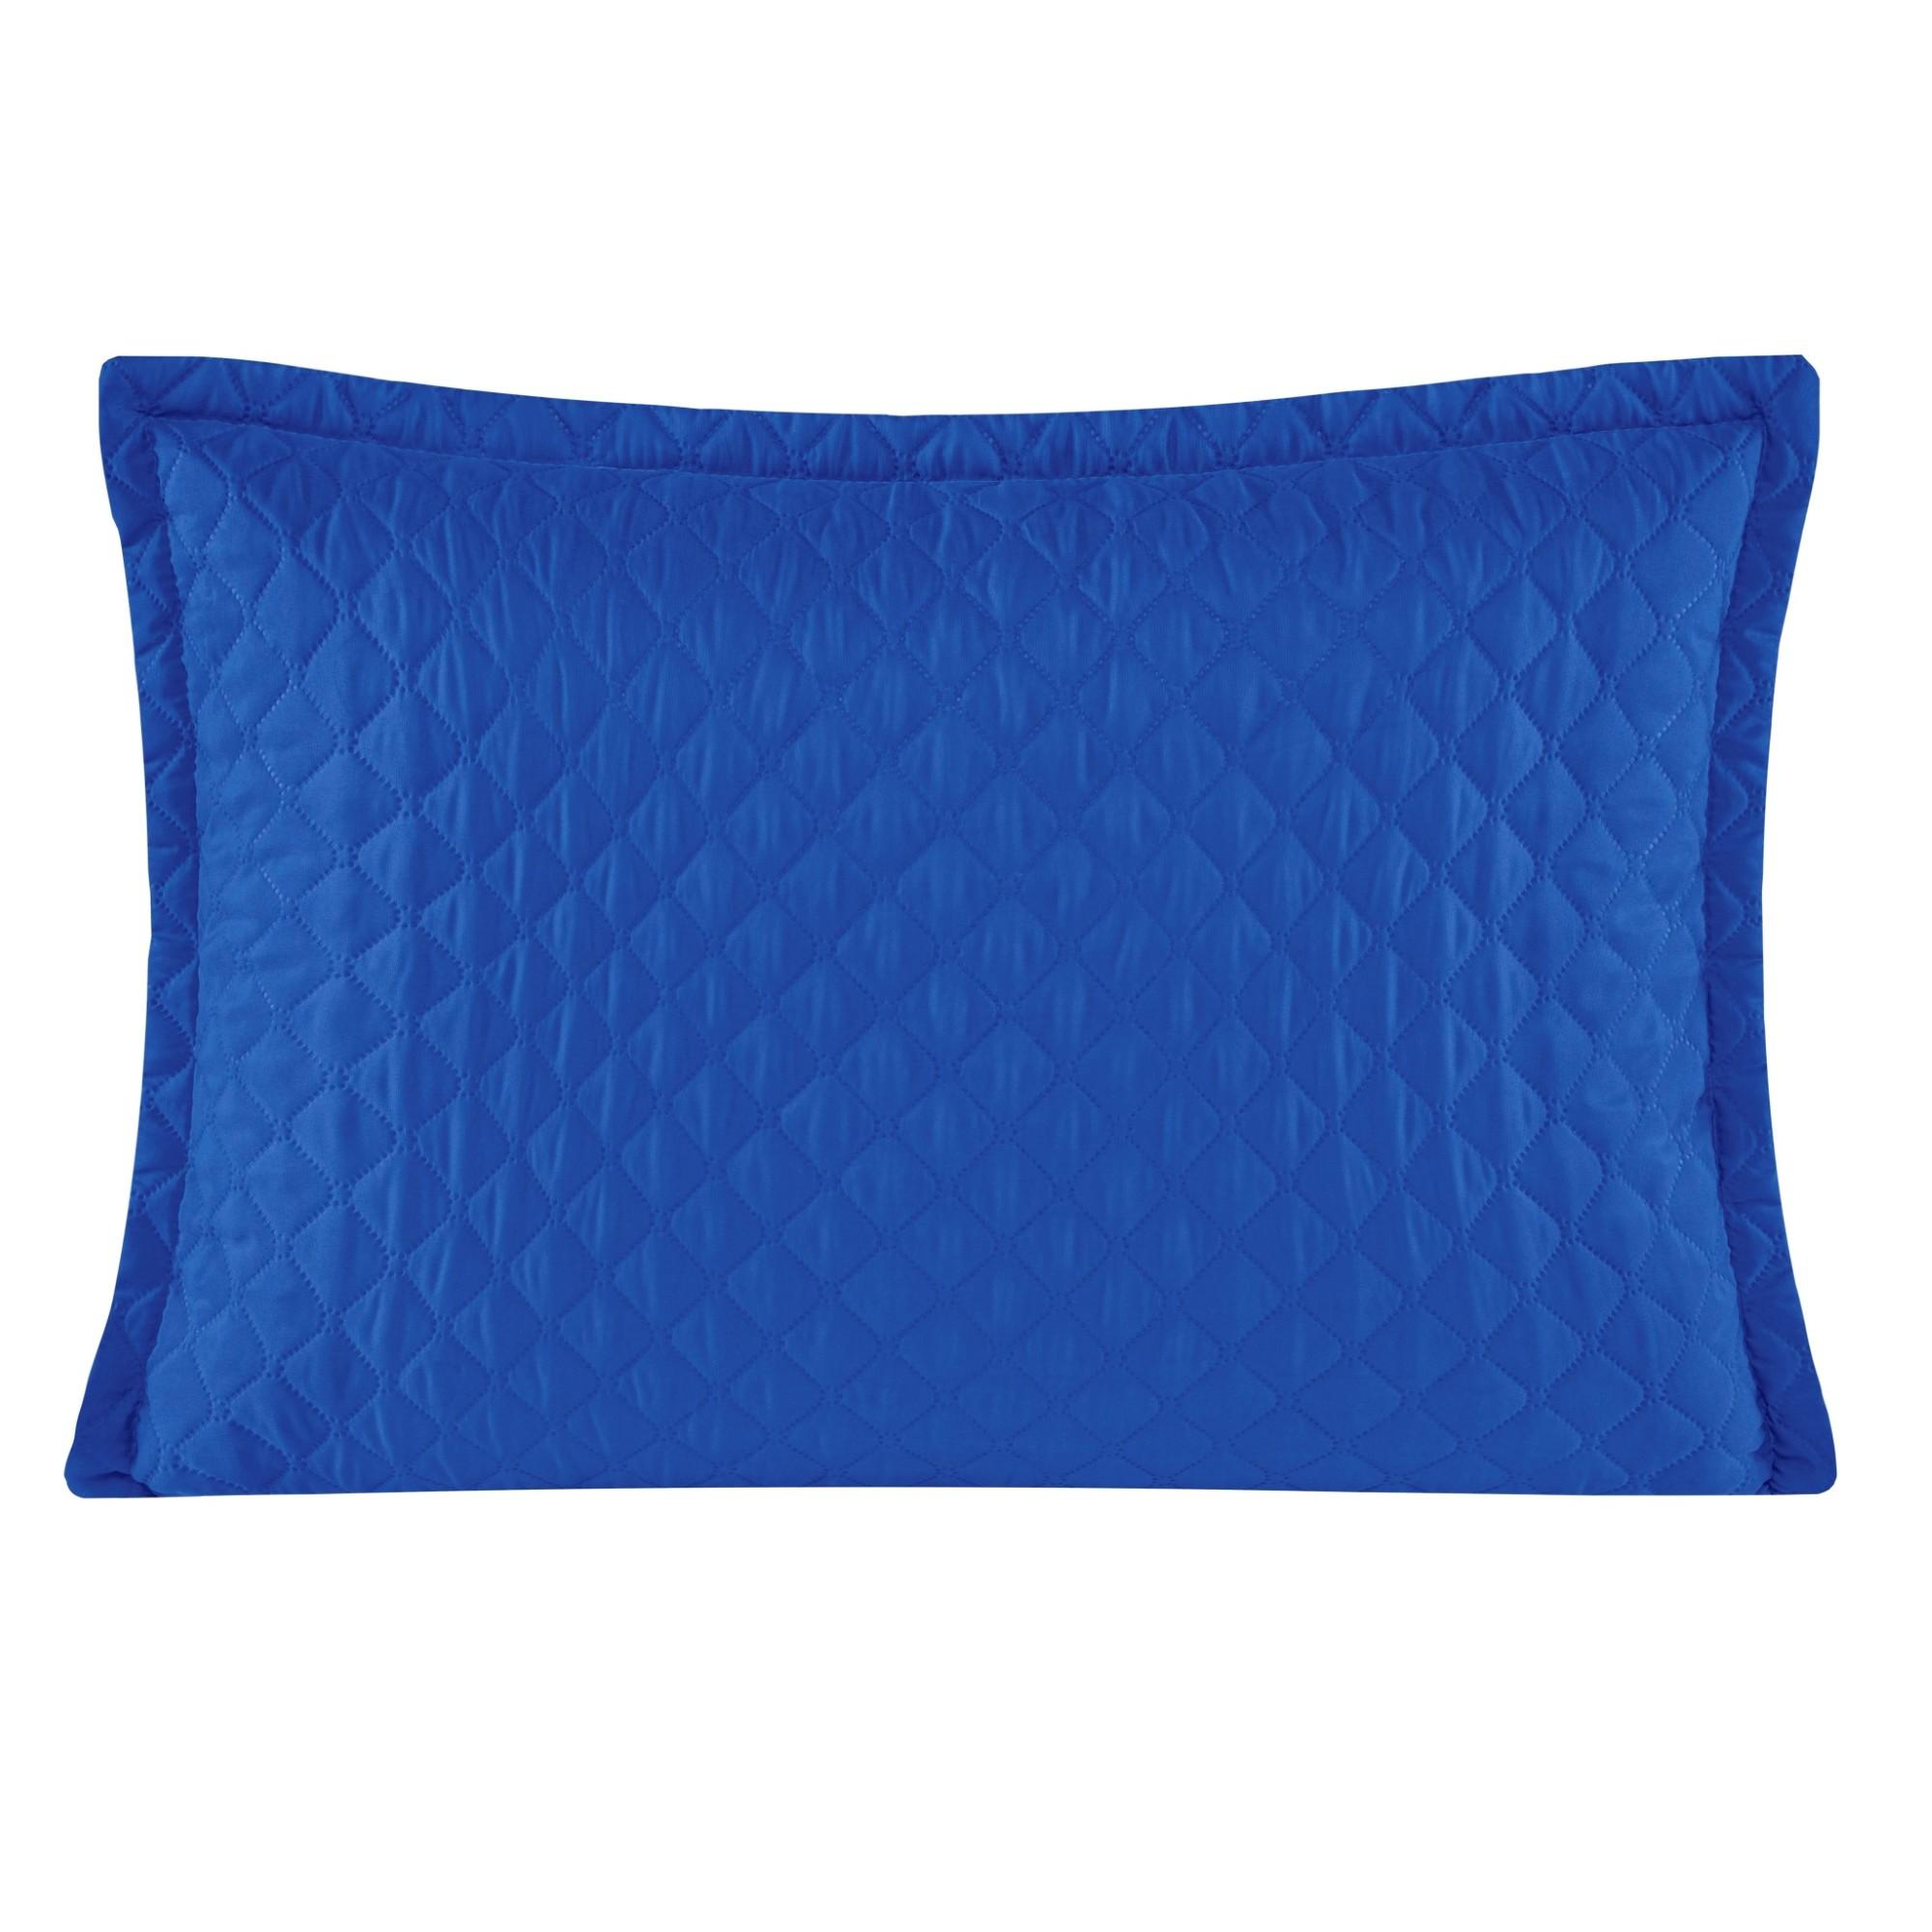 Porta Travesseiro 50 x 70 cm Delicata Azul - Yohana